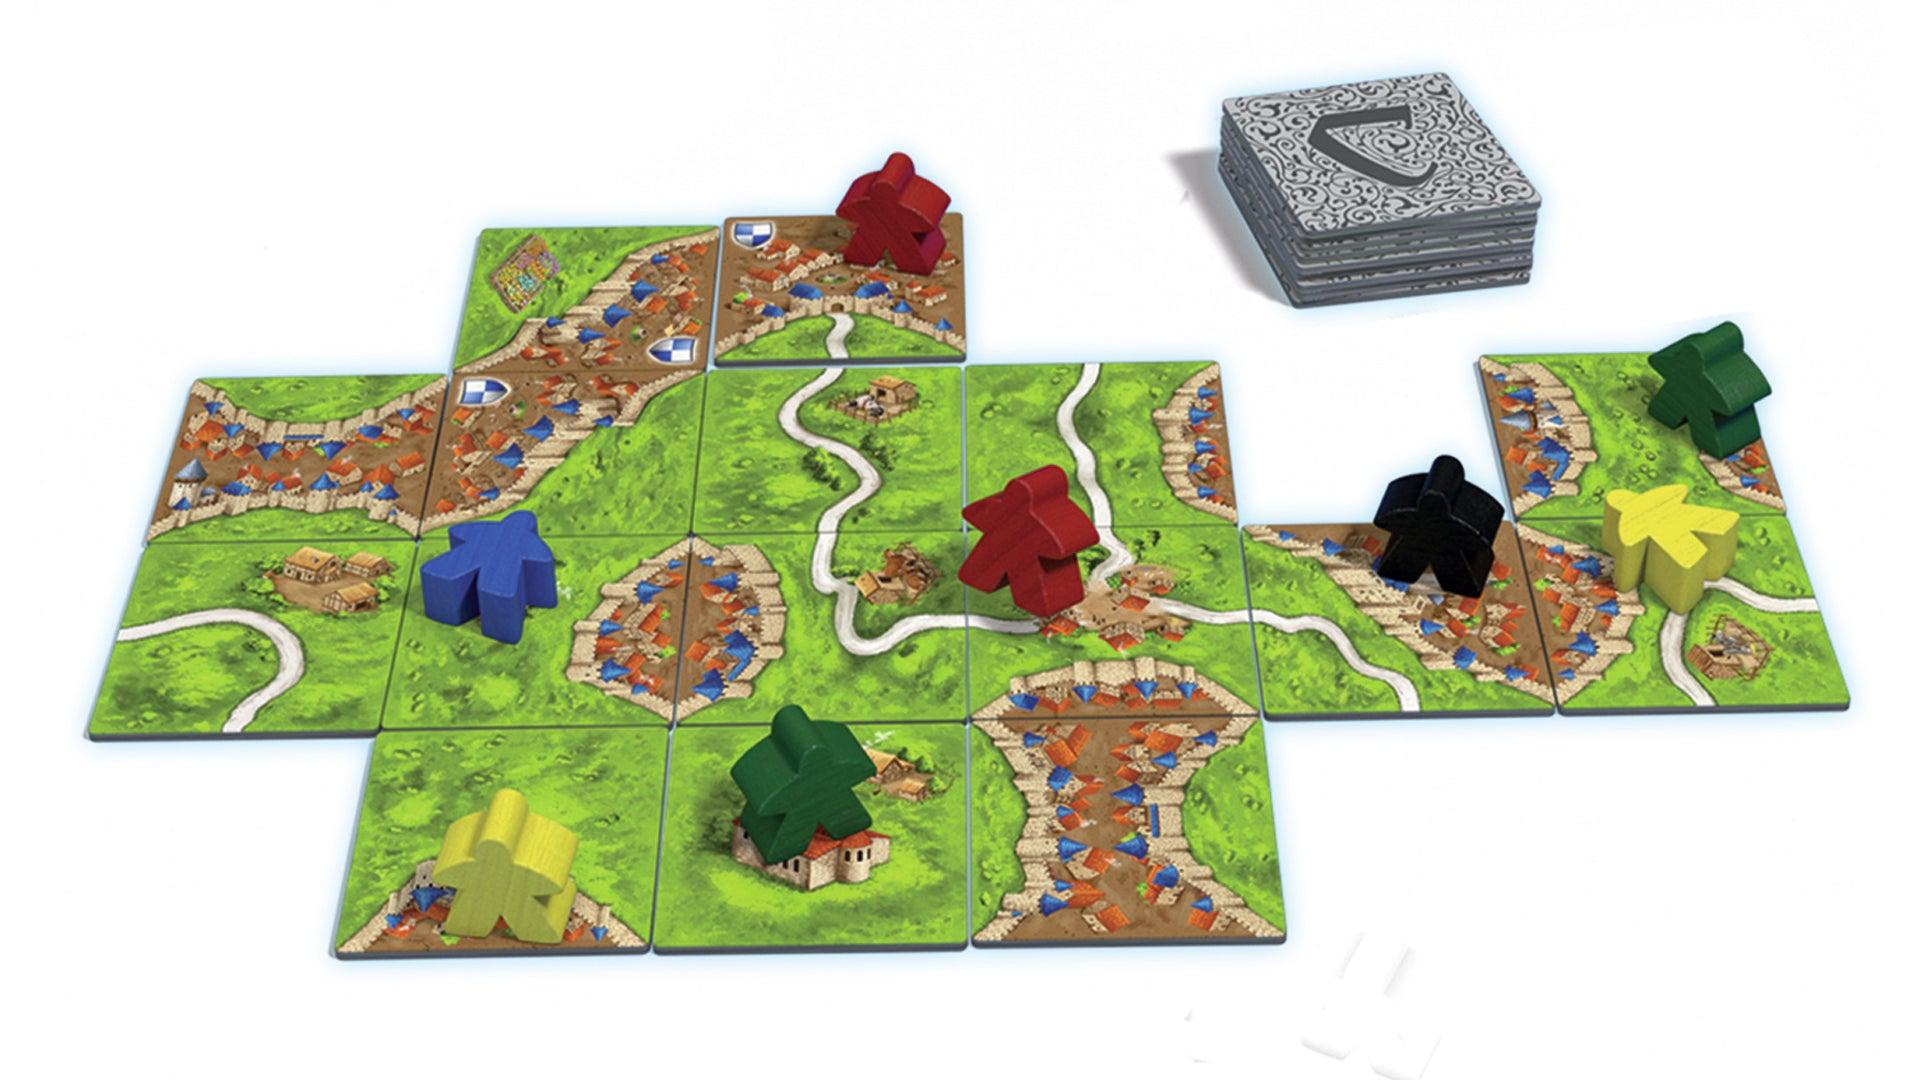 Carcassonne beginner board game gameplay layout